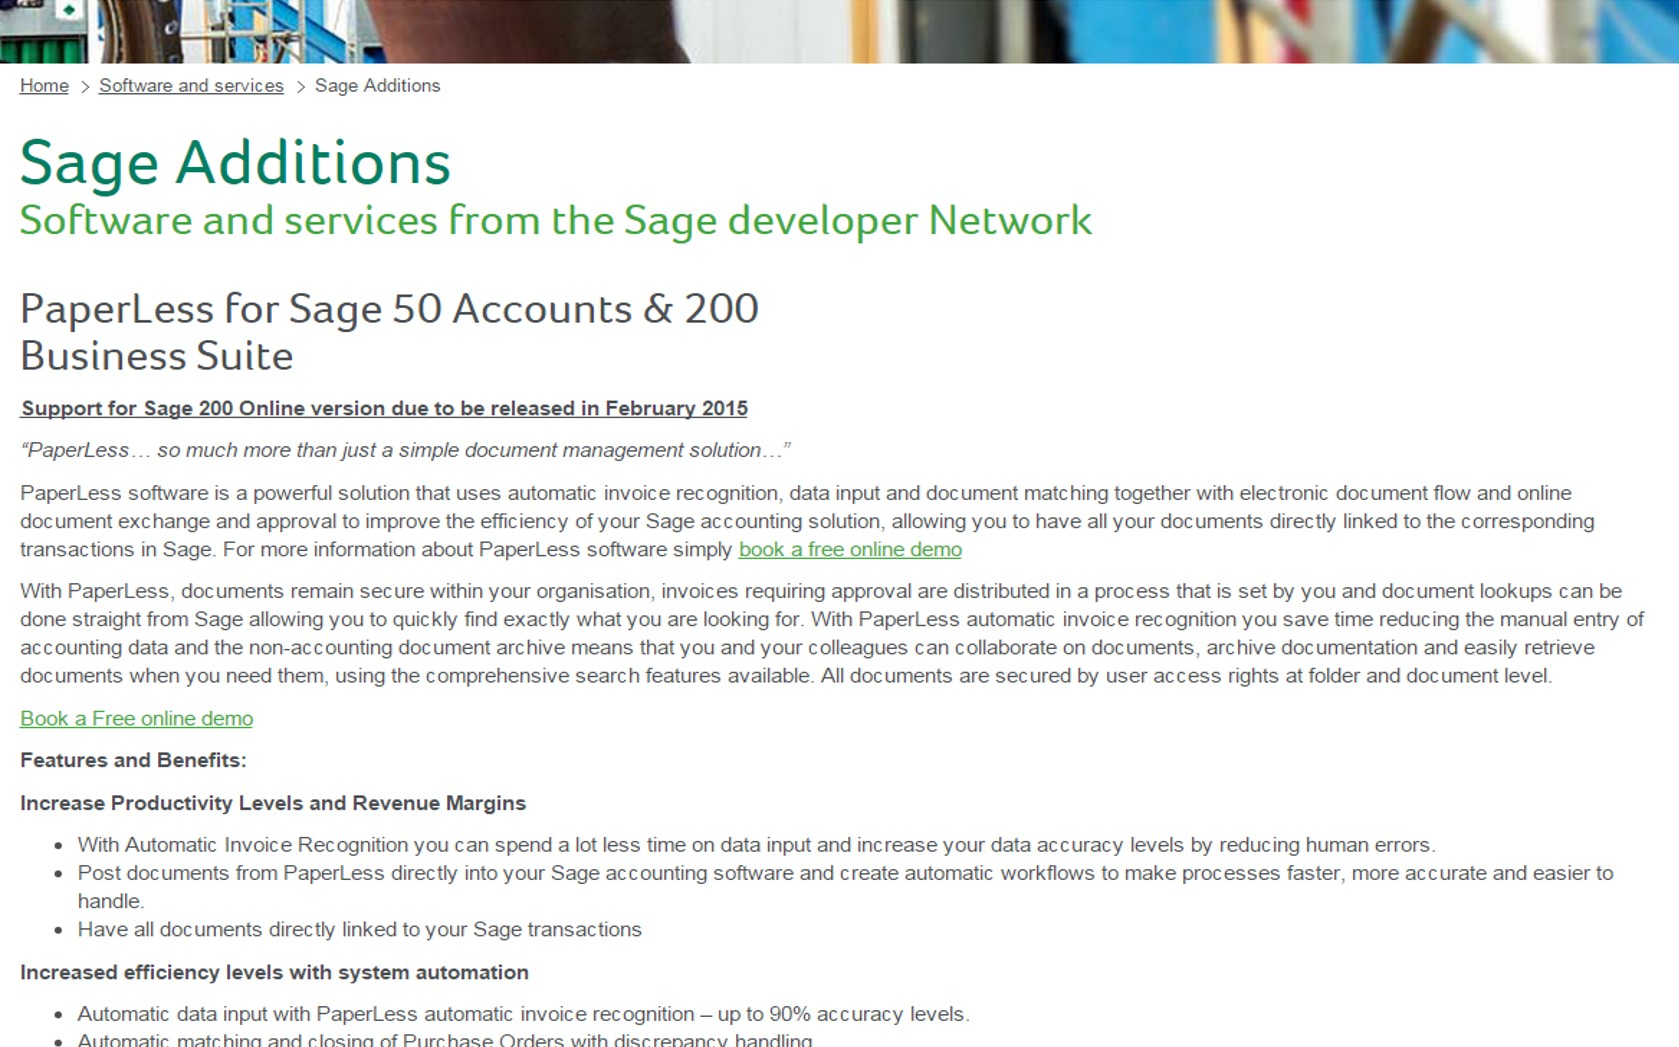 Sage Additions